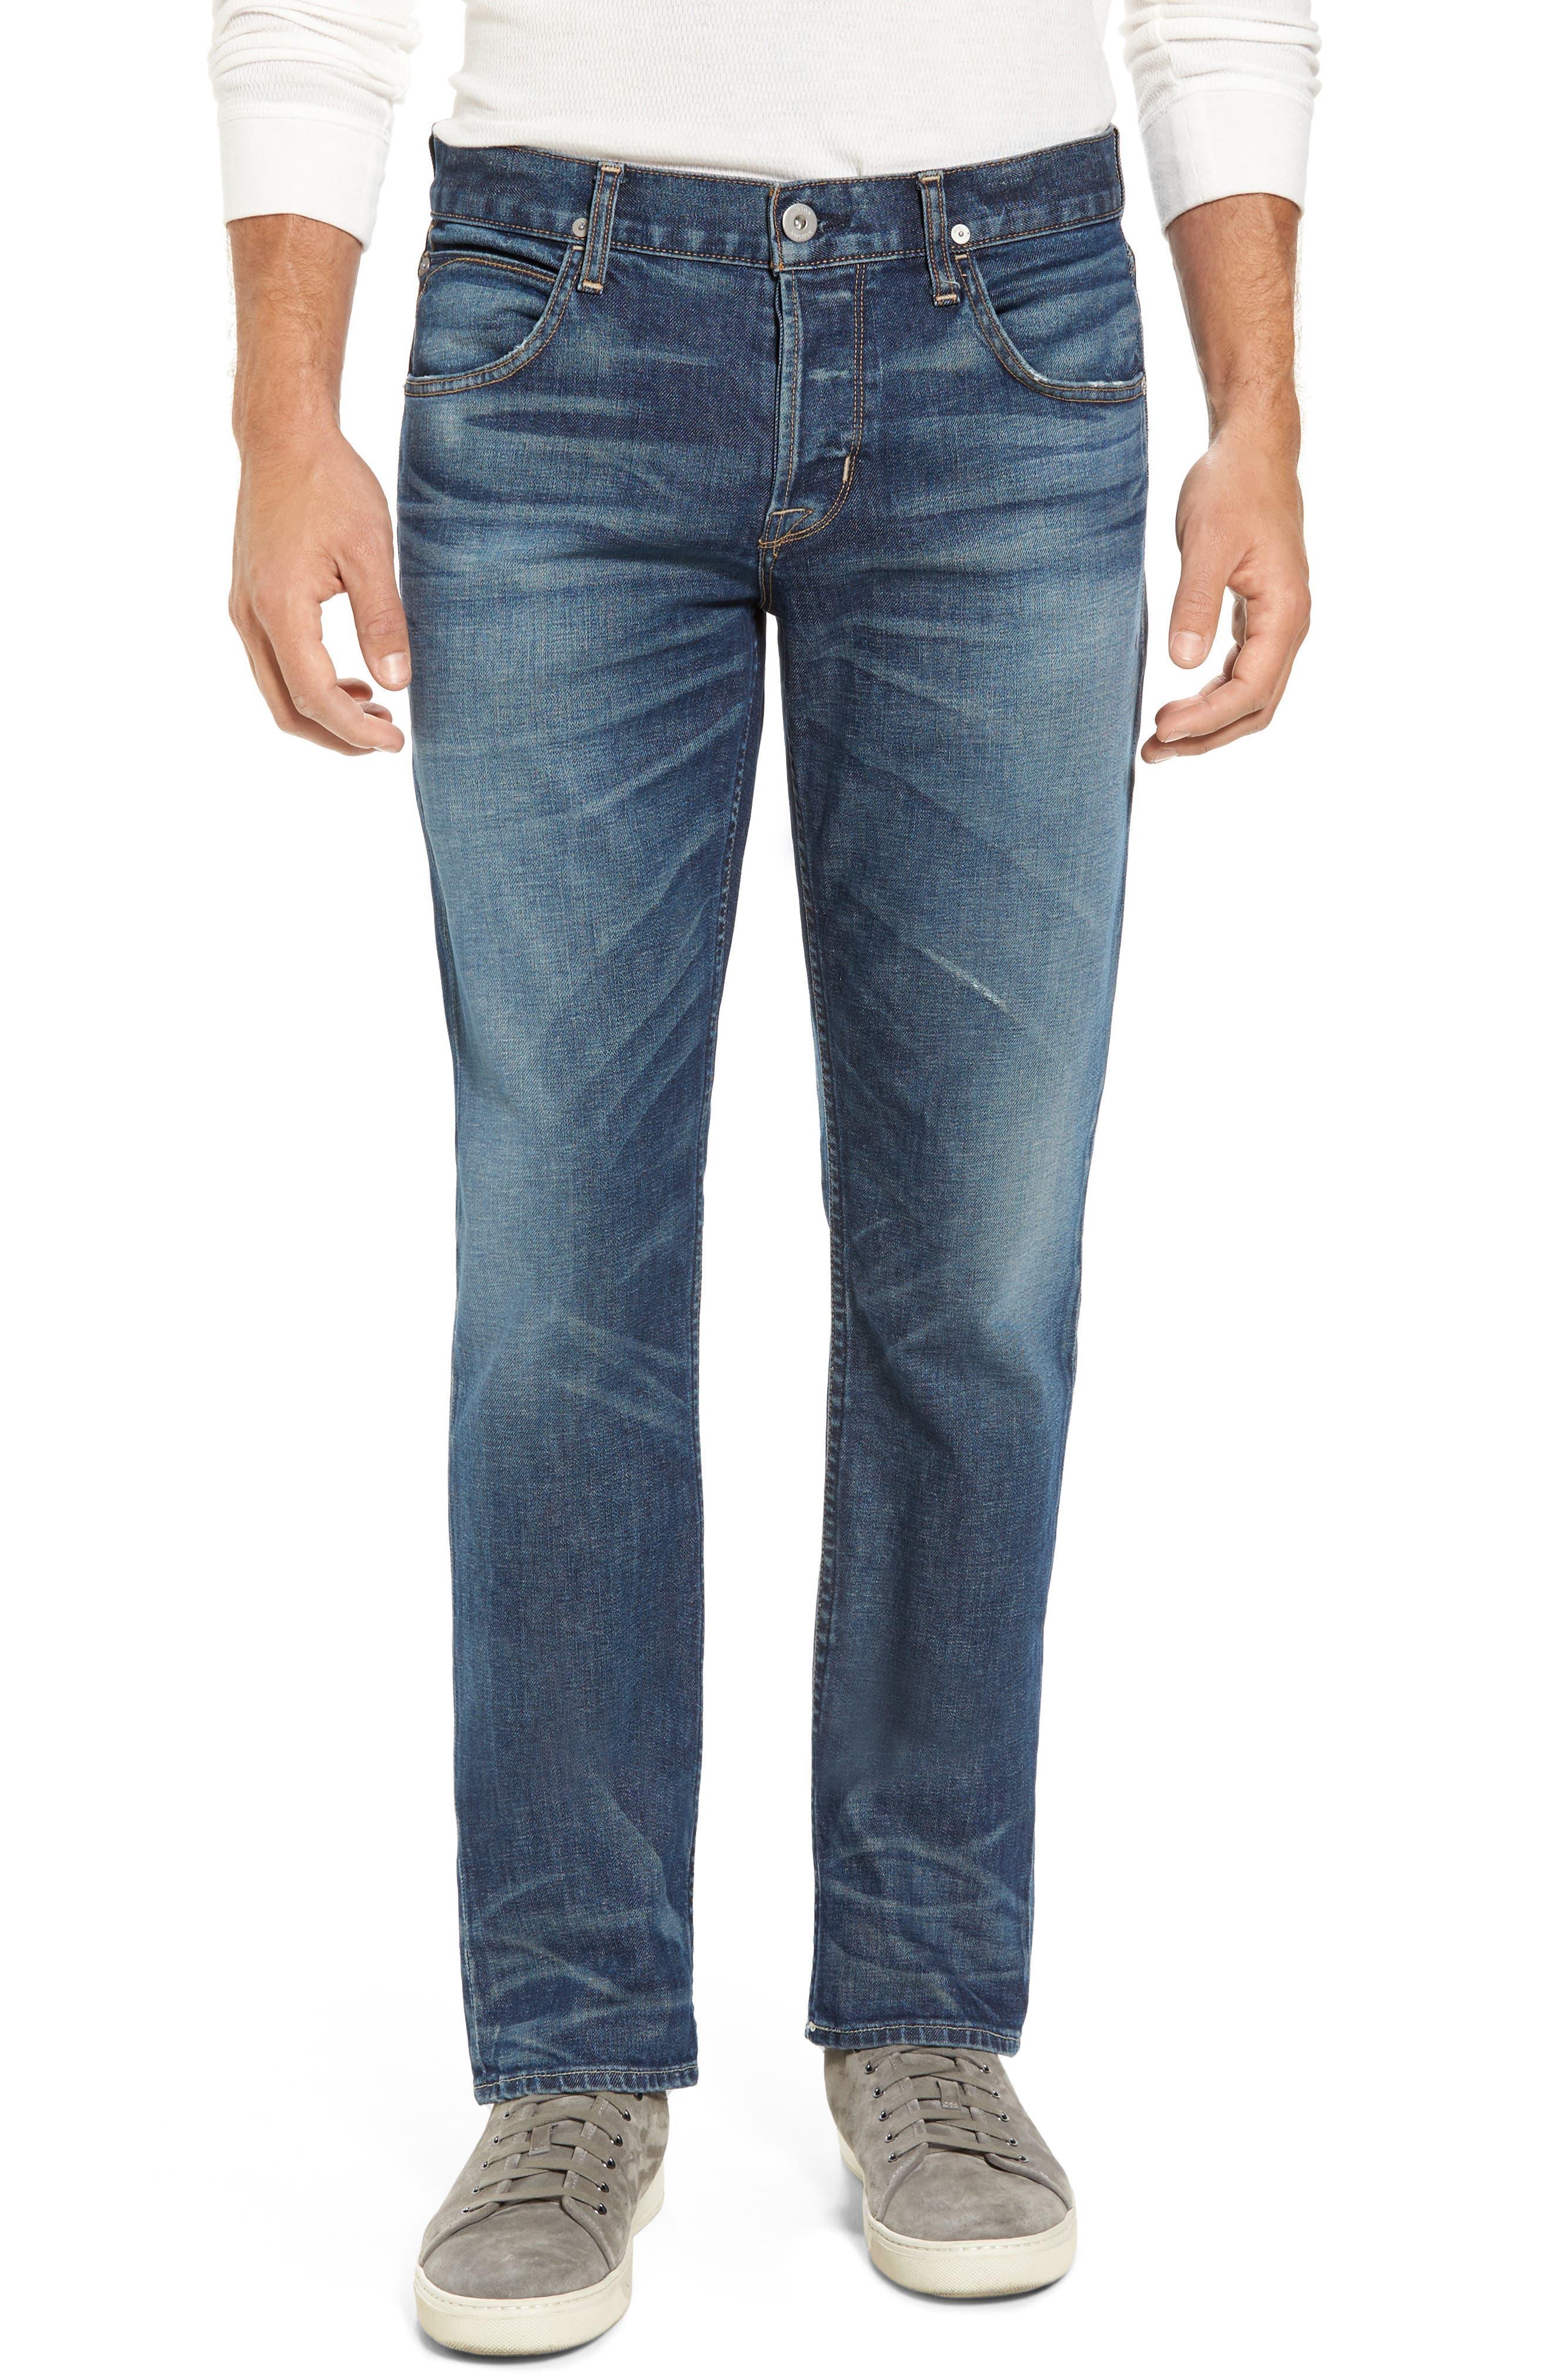 Alternate Image 1 Selected - Hudson Jeans Blake Slim Fit Jeans (Scribe)